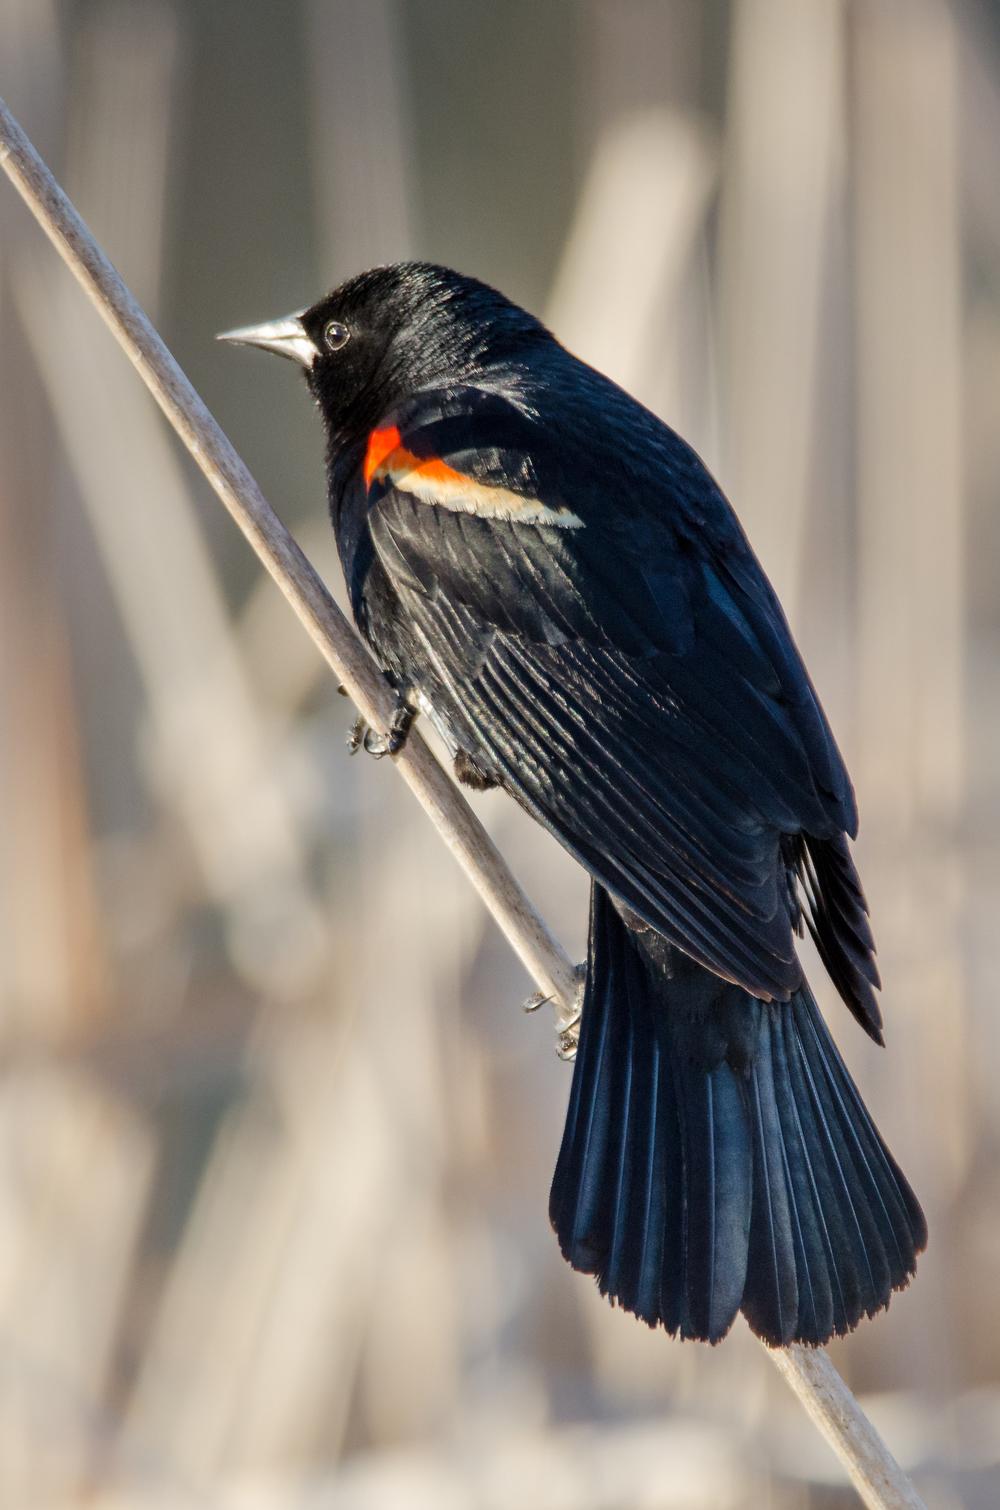 Male  Red-Winged Blackbird  Nikon D7000 ISO 800 600mm f/7.1 1/640 sec